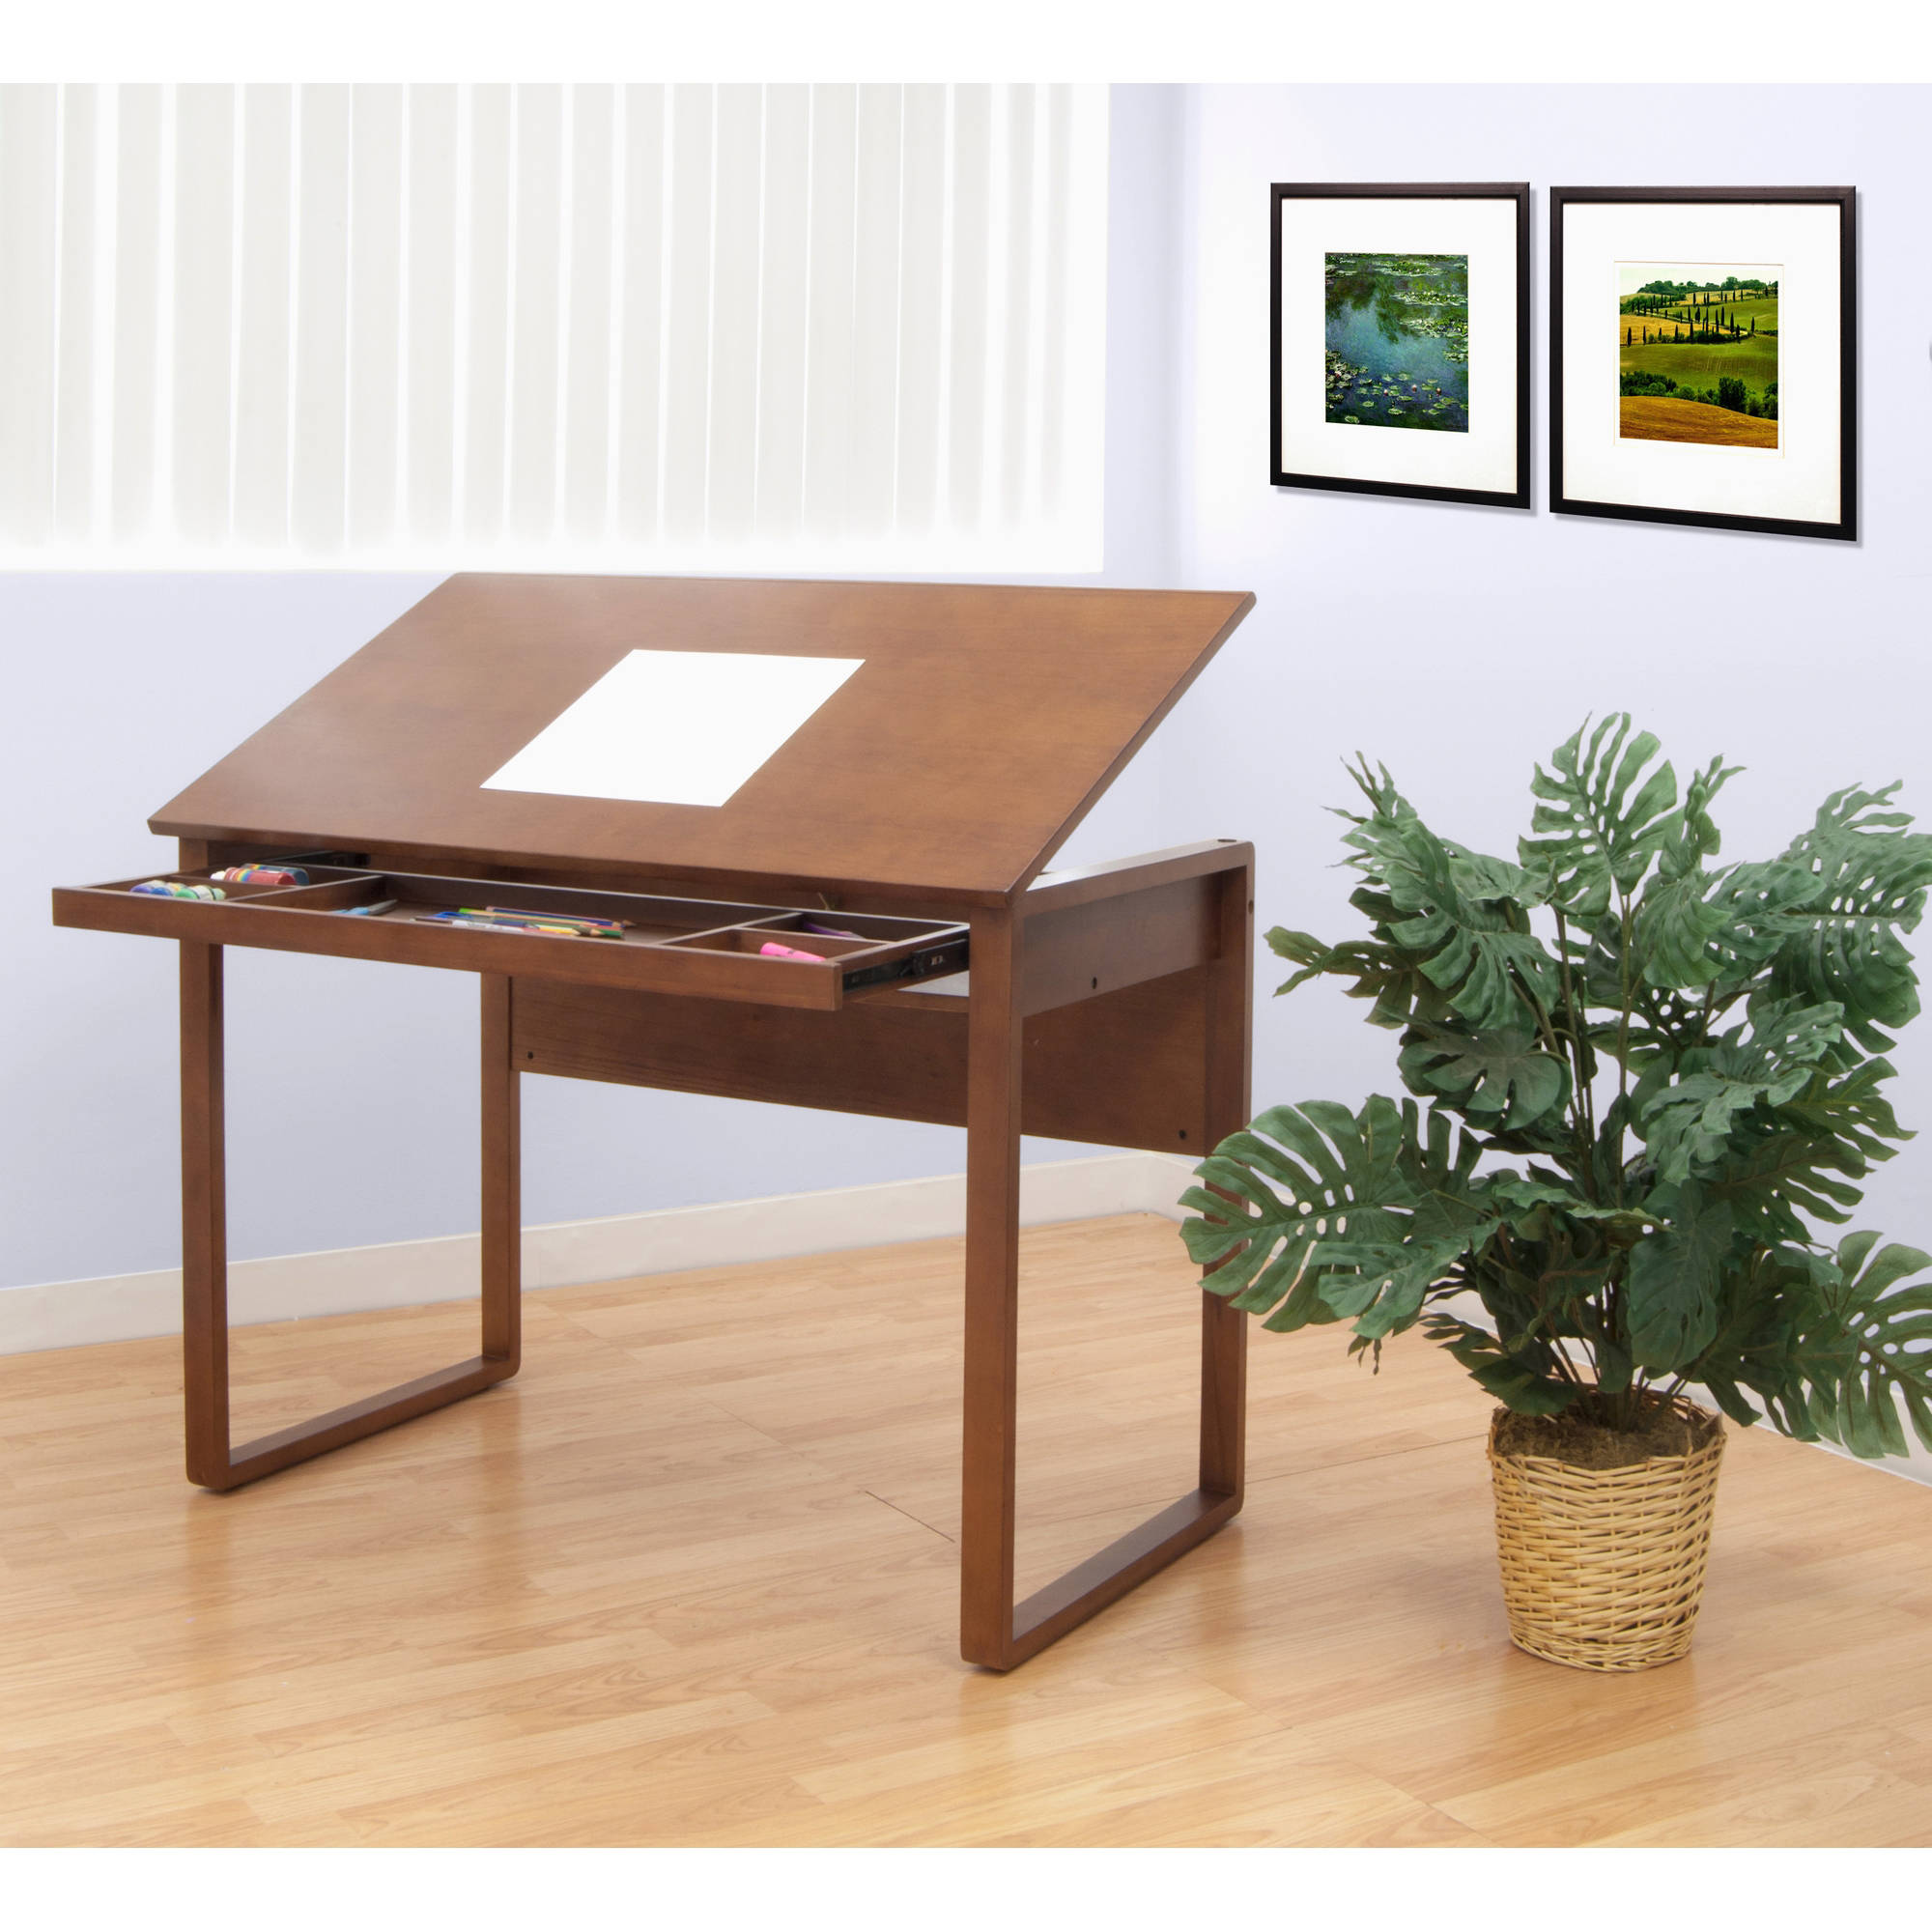 studio designs ponderosa wood tilting top tablesonoma brown walmartcom - Drawing Desk